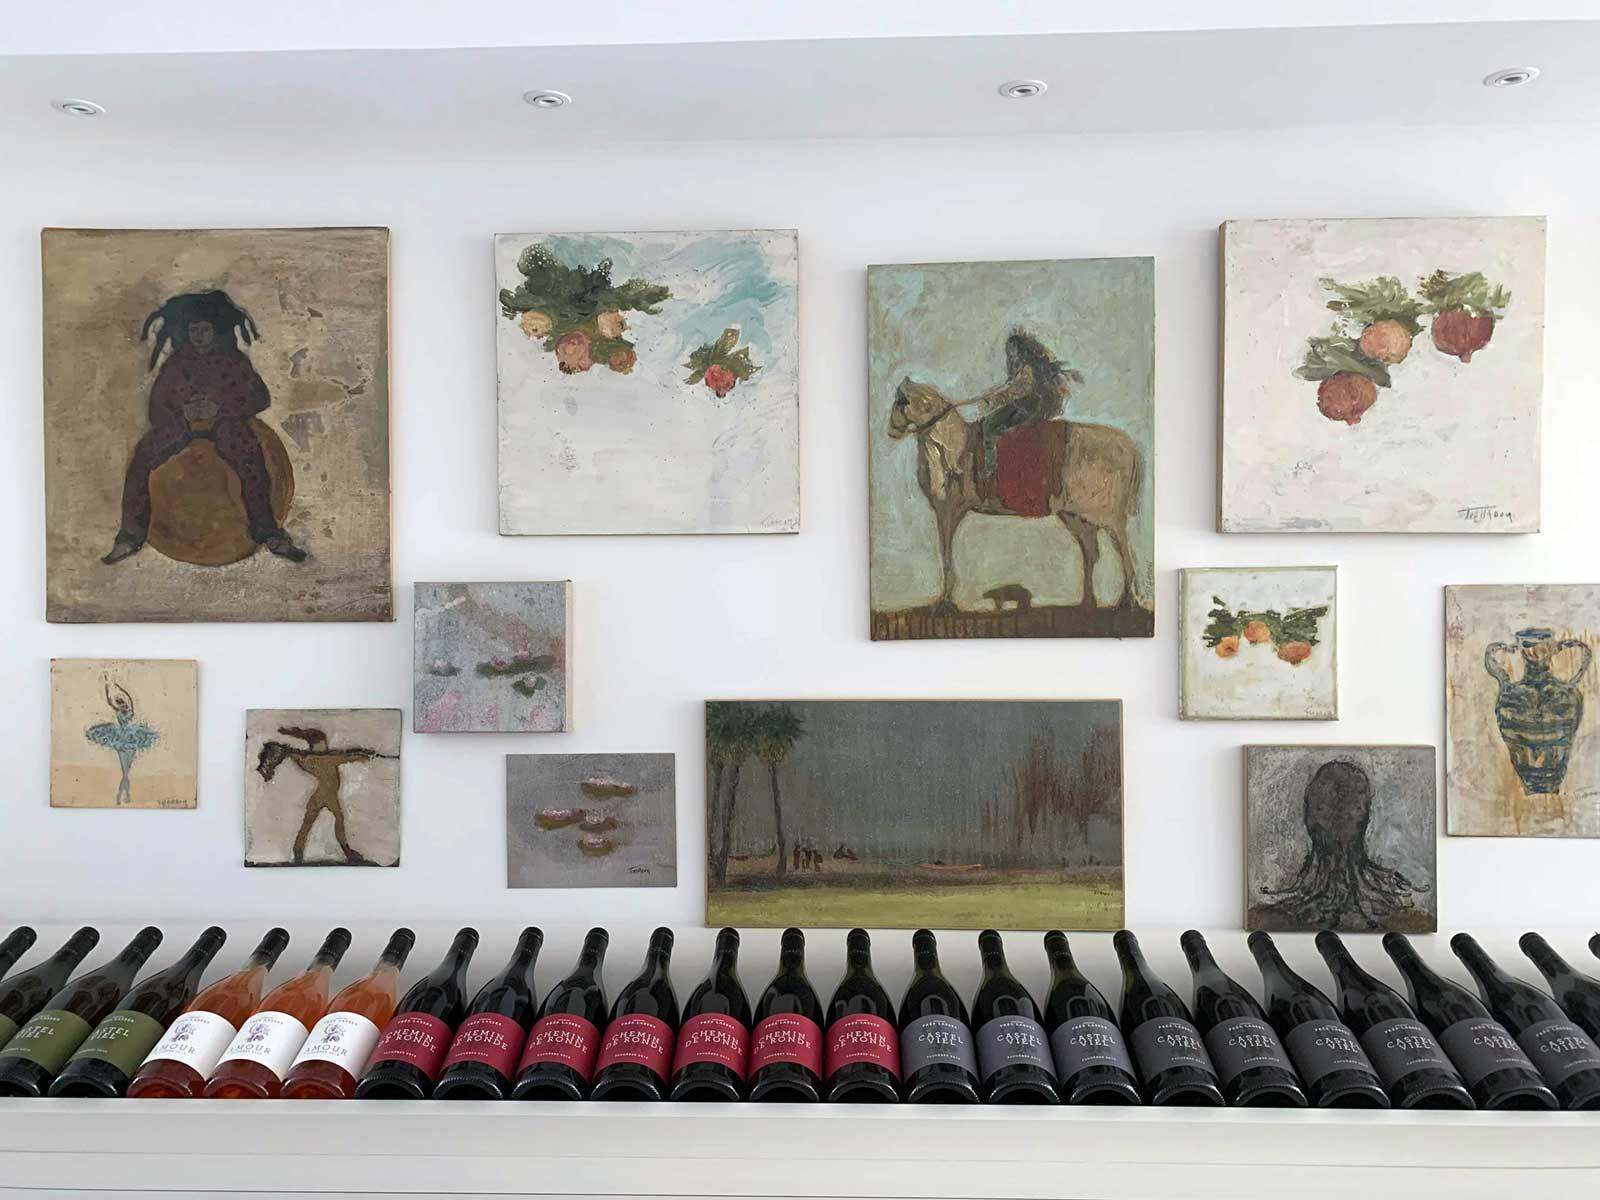 Corinne Tichadou artiste peintre galerie artiste peintre Bézier tableaux peinture art contemporain